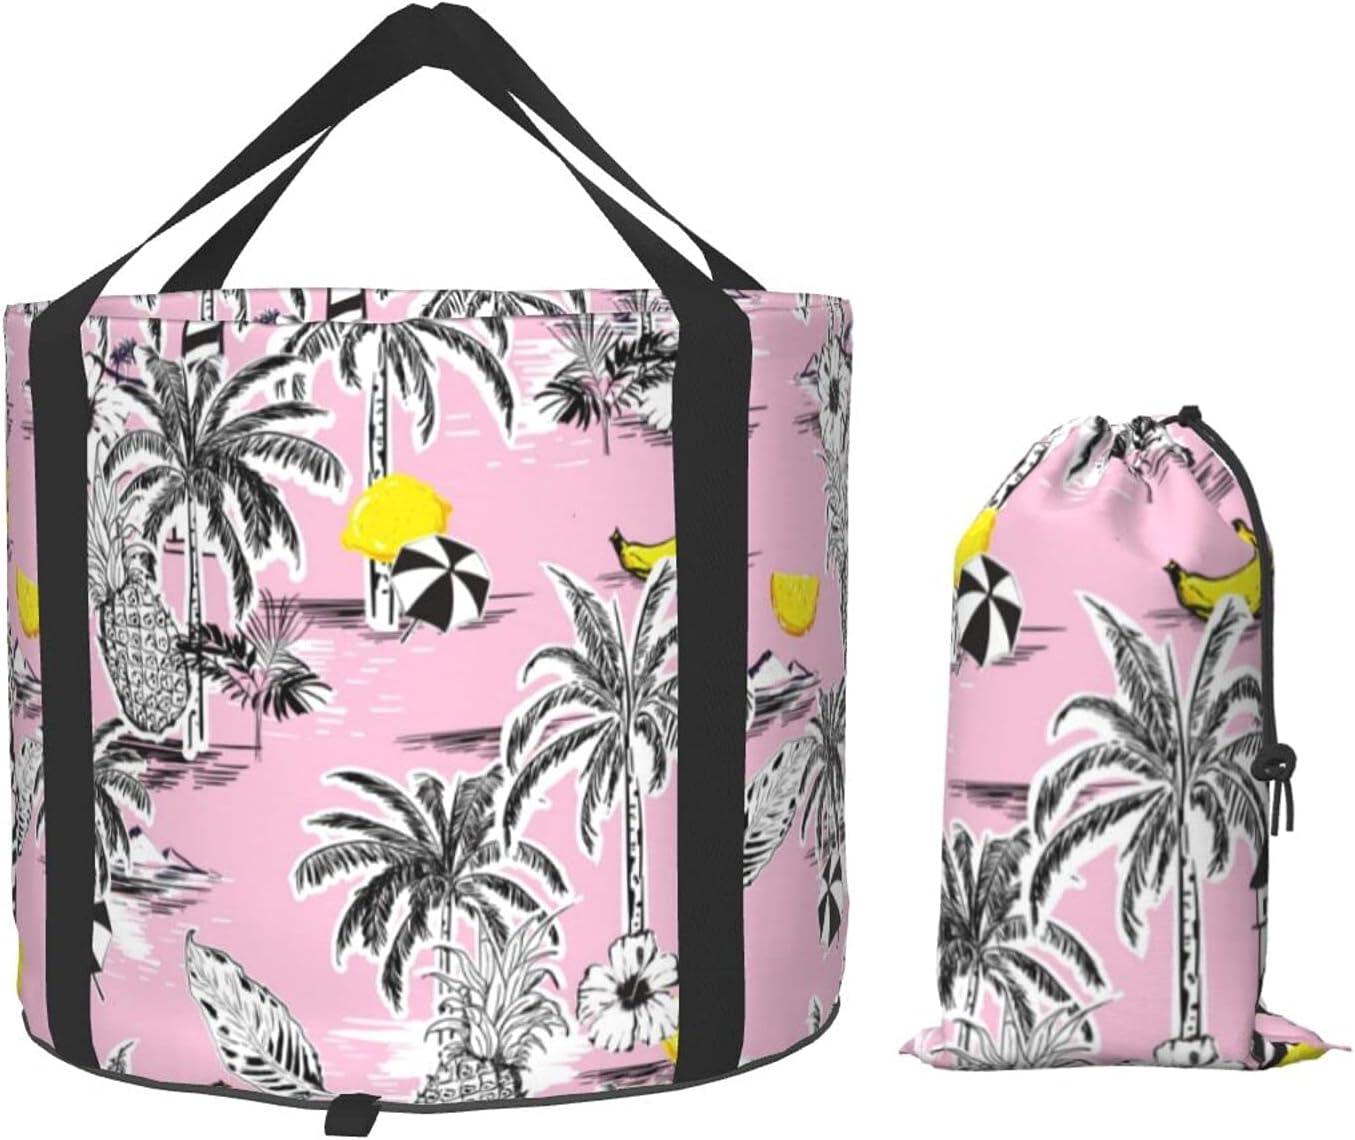 Summer Beach Coconut Tree Pineapple Collapsible Banana Mu Bucket Japan's largest Mail order assortment